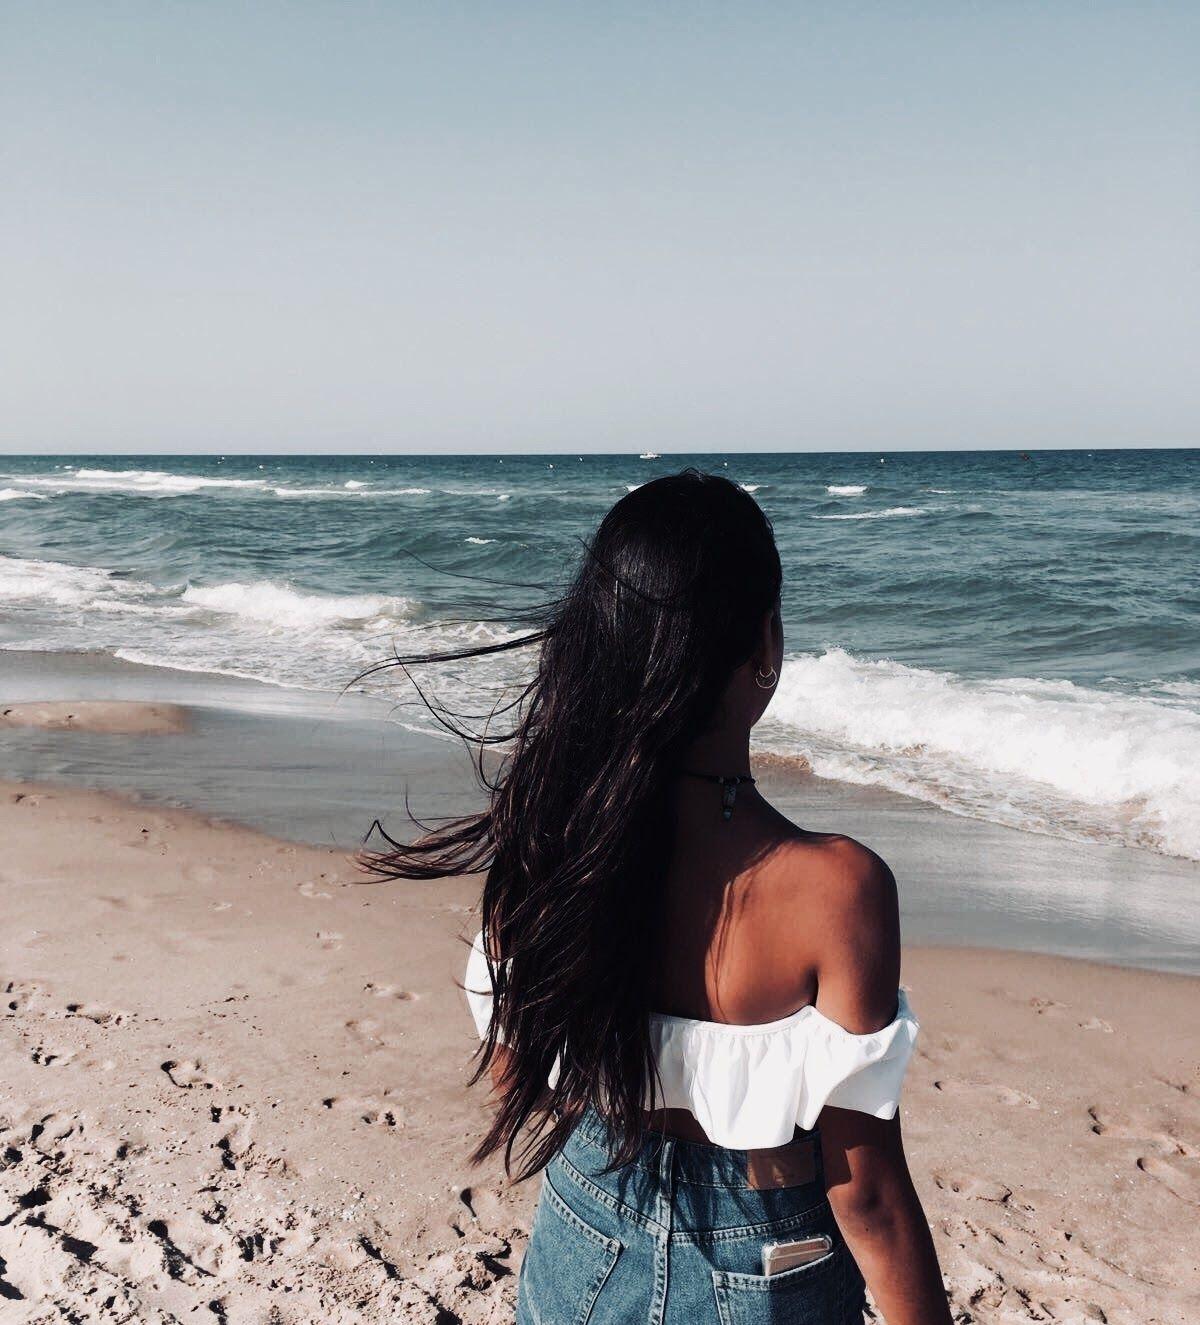 Картинки девушки брюнетки спиной на море